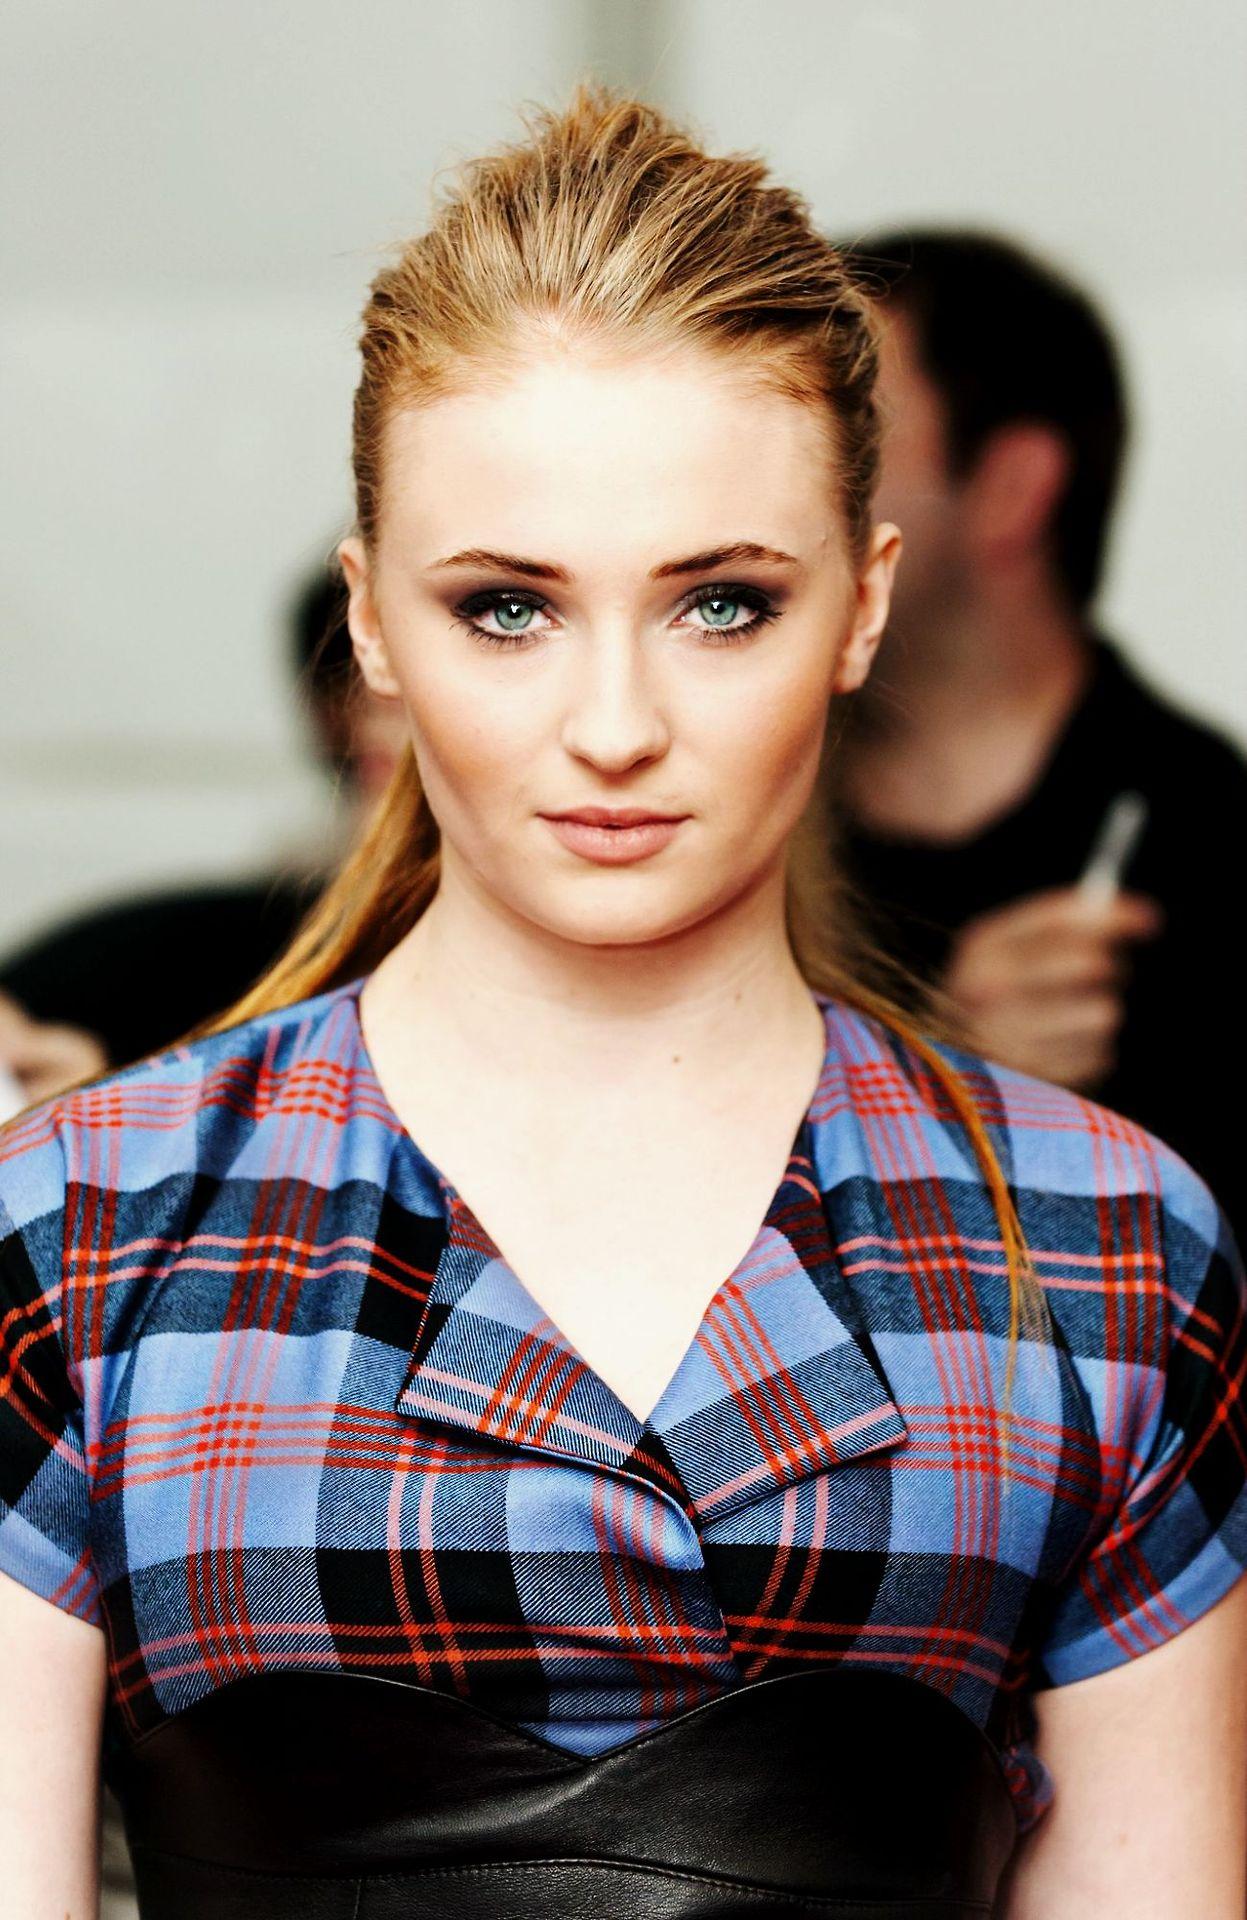 Sexy sansa stark Sandor Clegane/Sansa